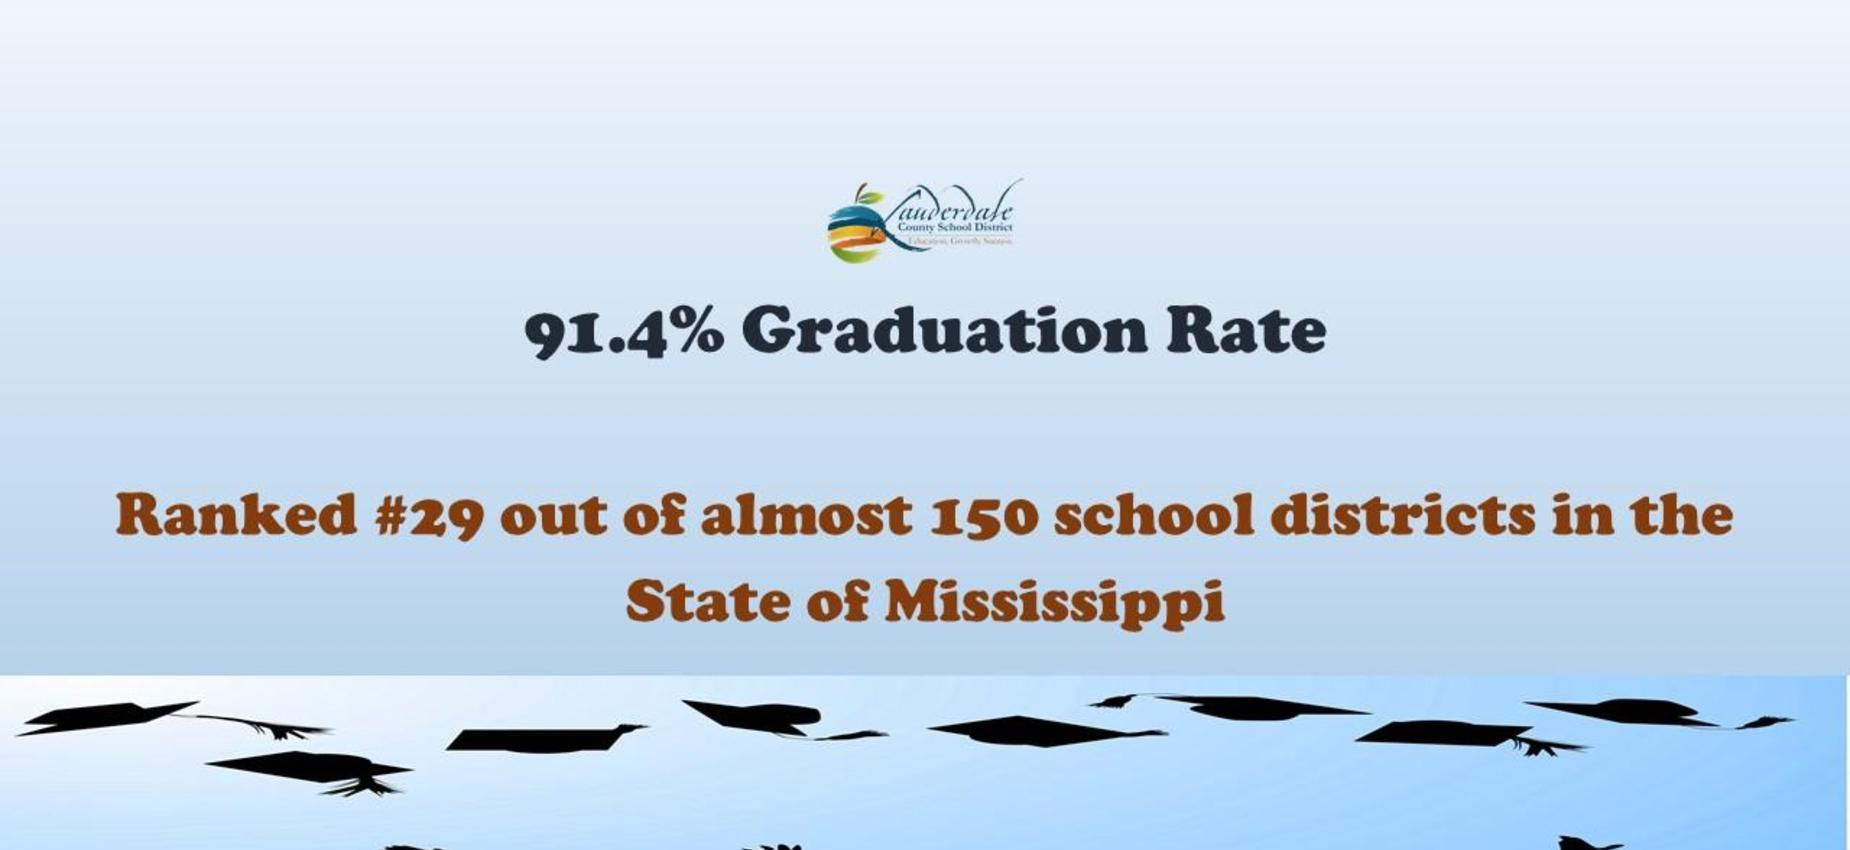 Graduation Rate Graphic